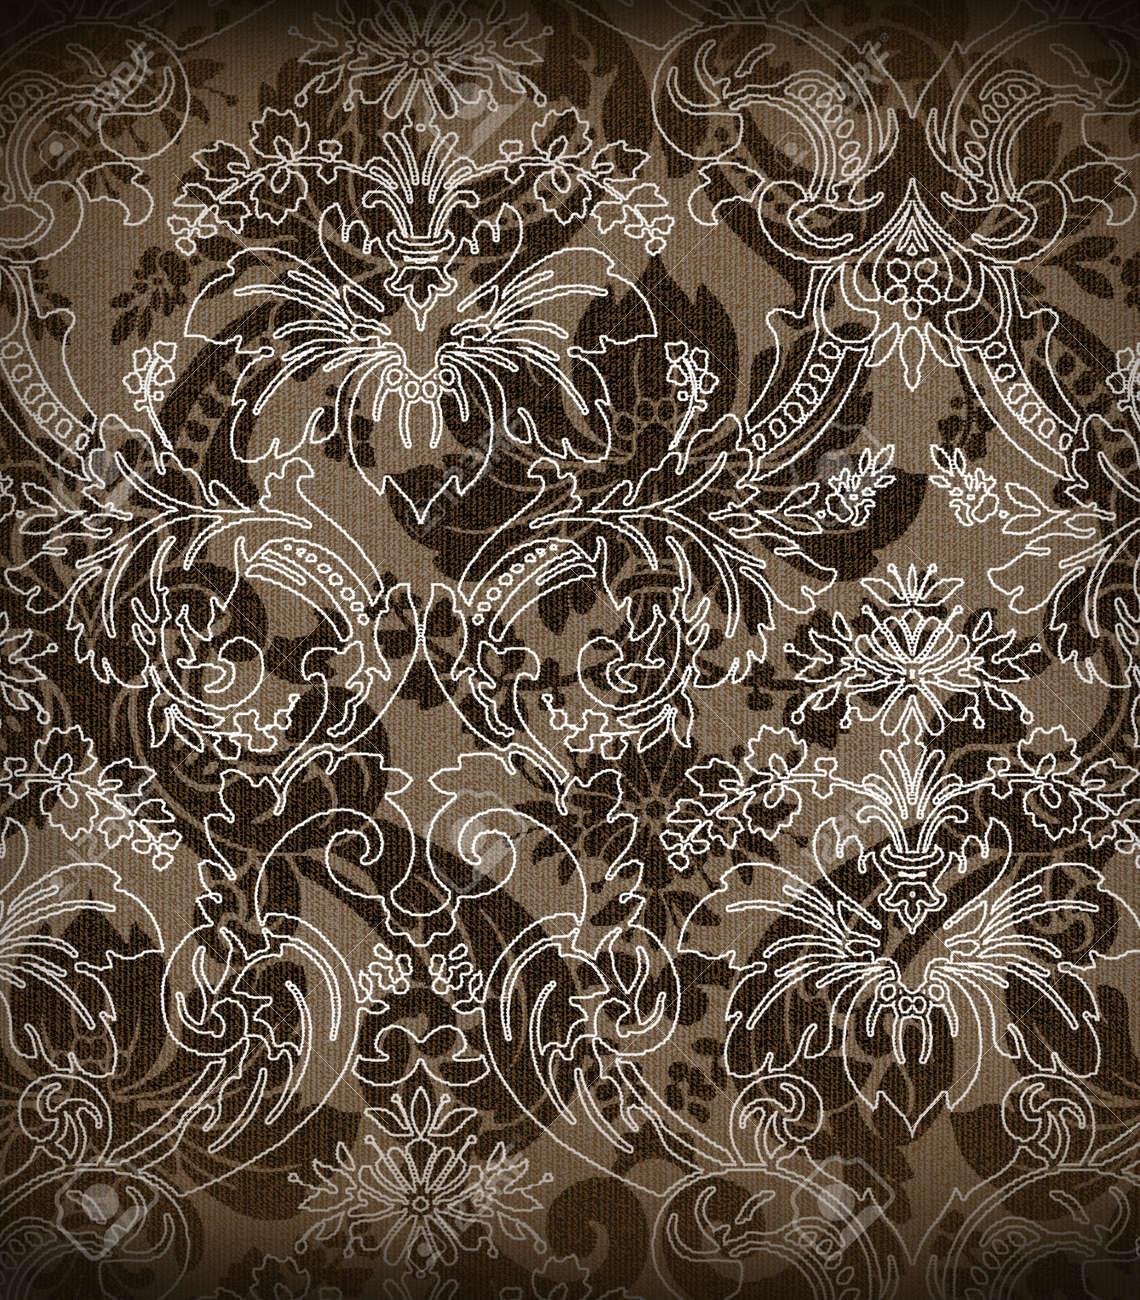 Decorative renaissance background Stock Photo - 4607787